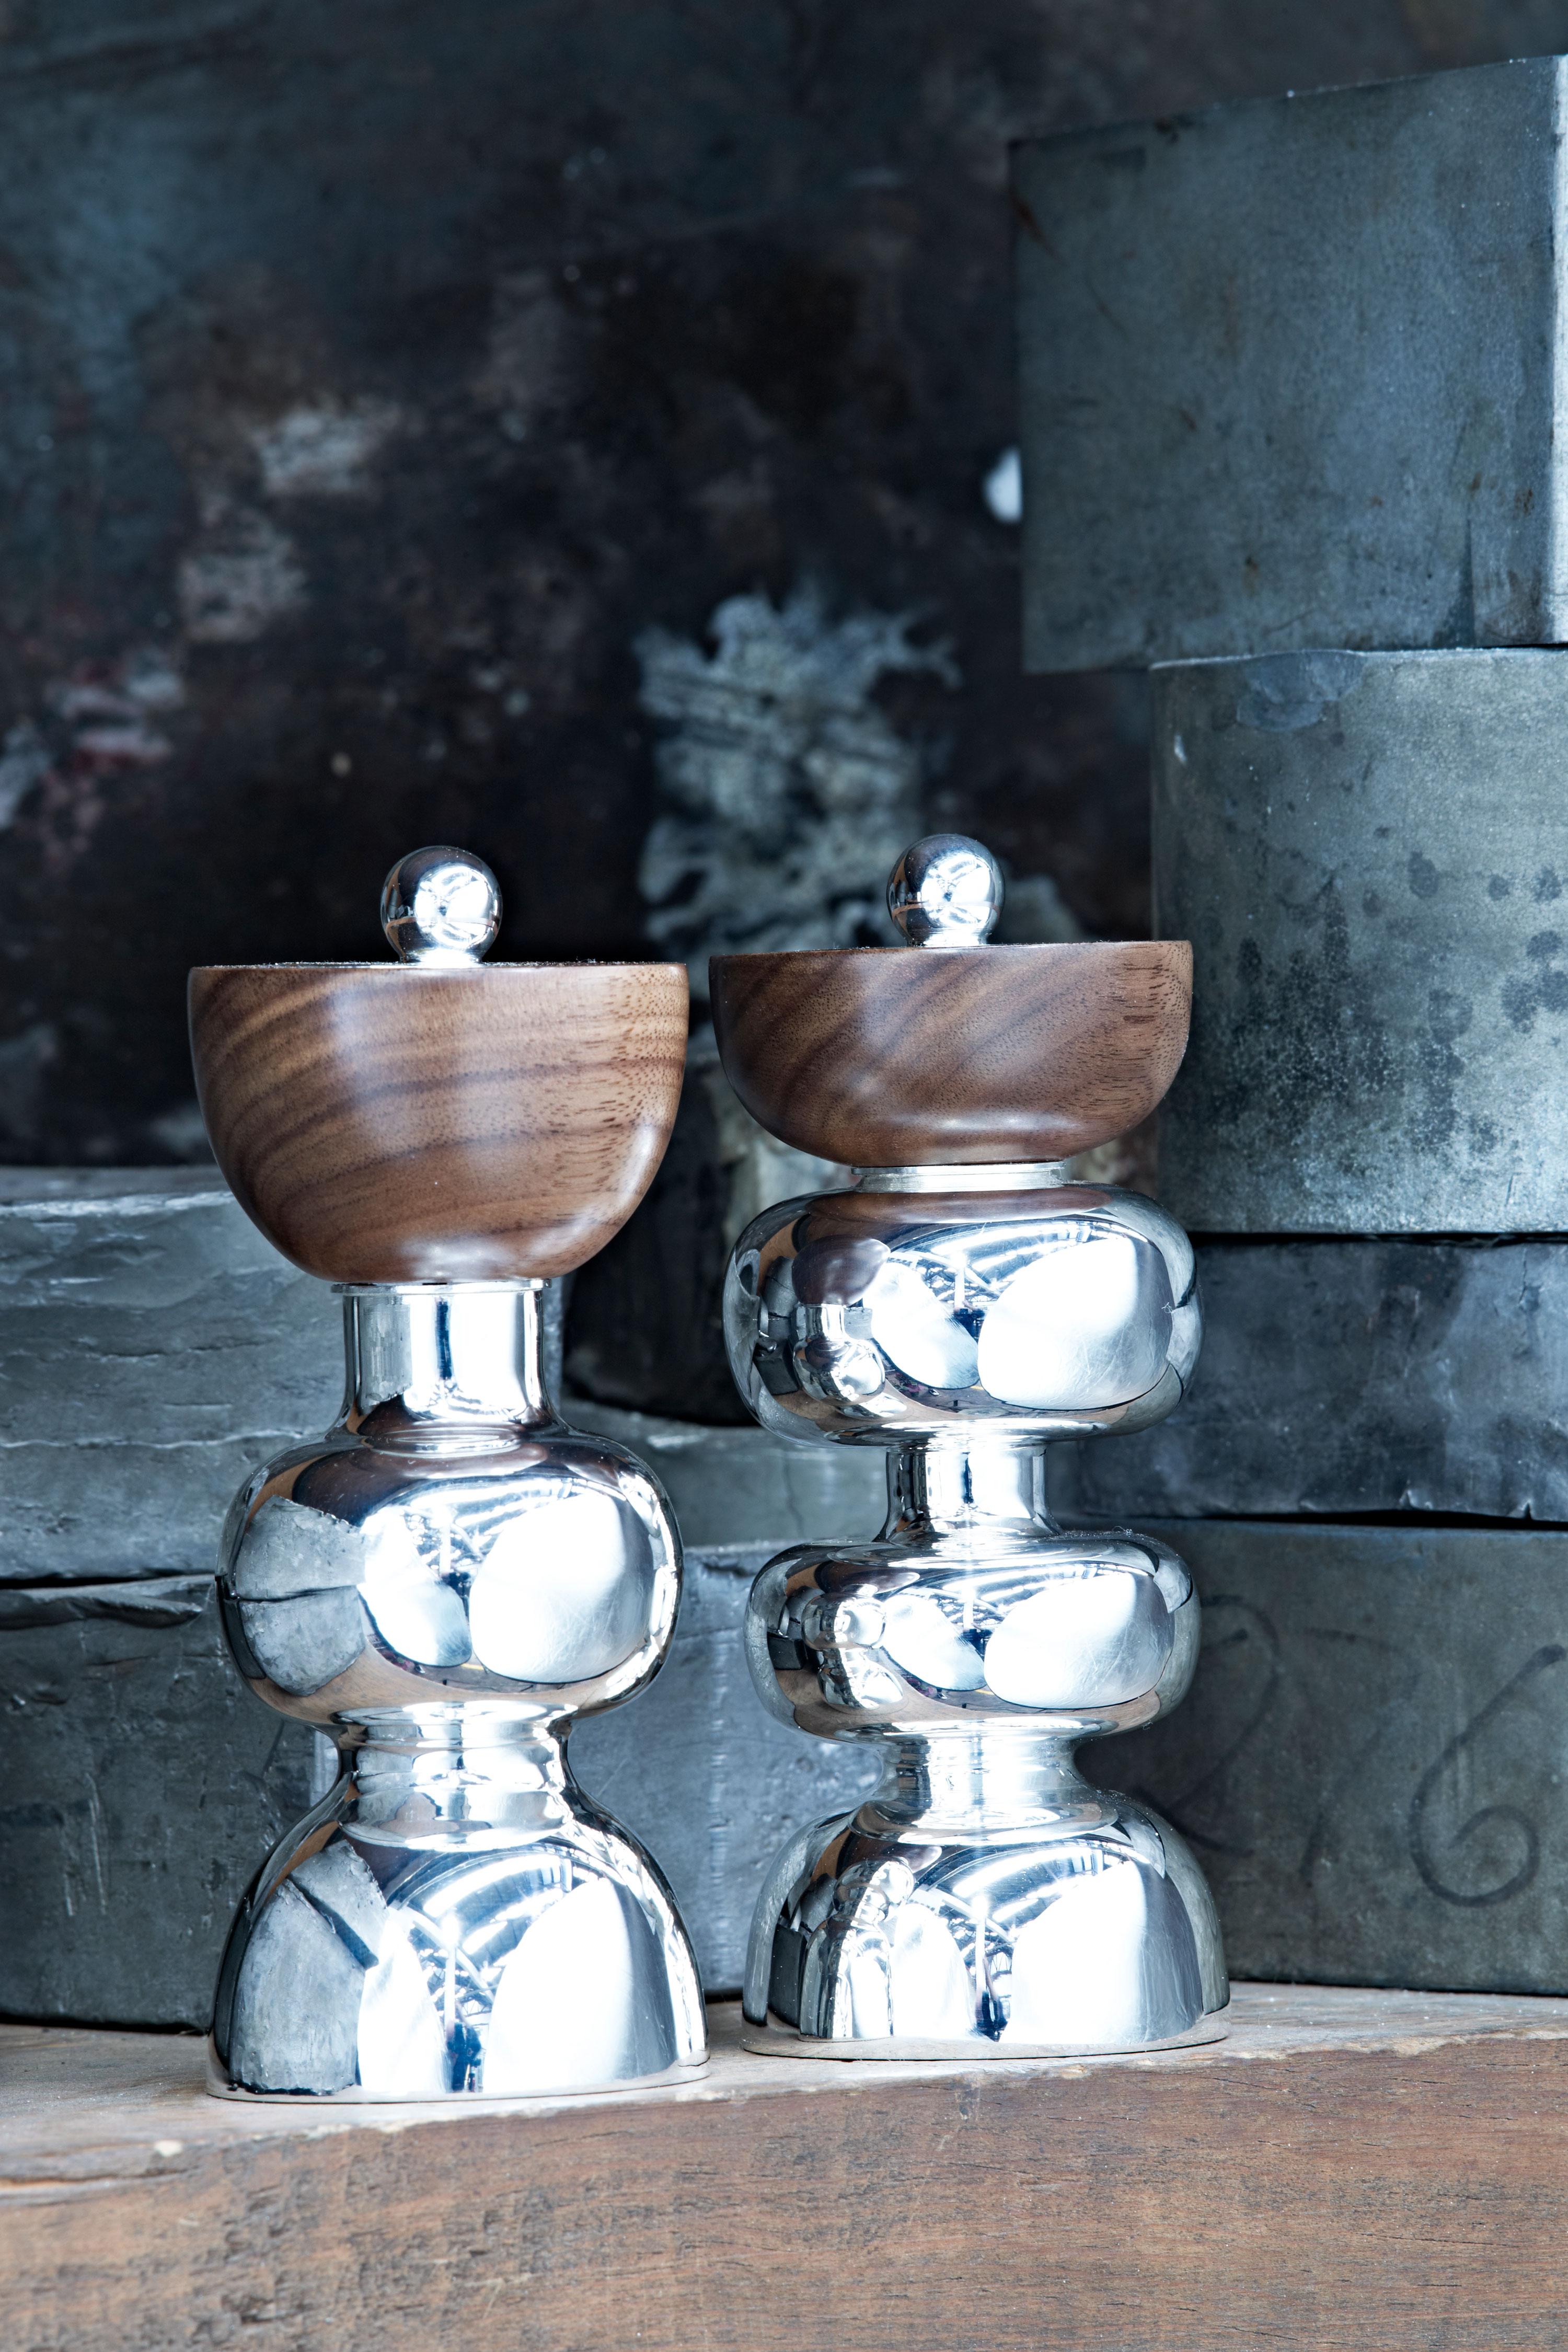 Tane Silverware Tableware Handmade in Mexico Designed by London Studio Bodo Sperlein